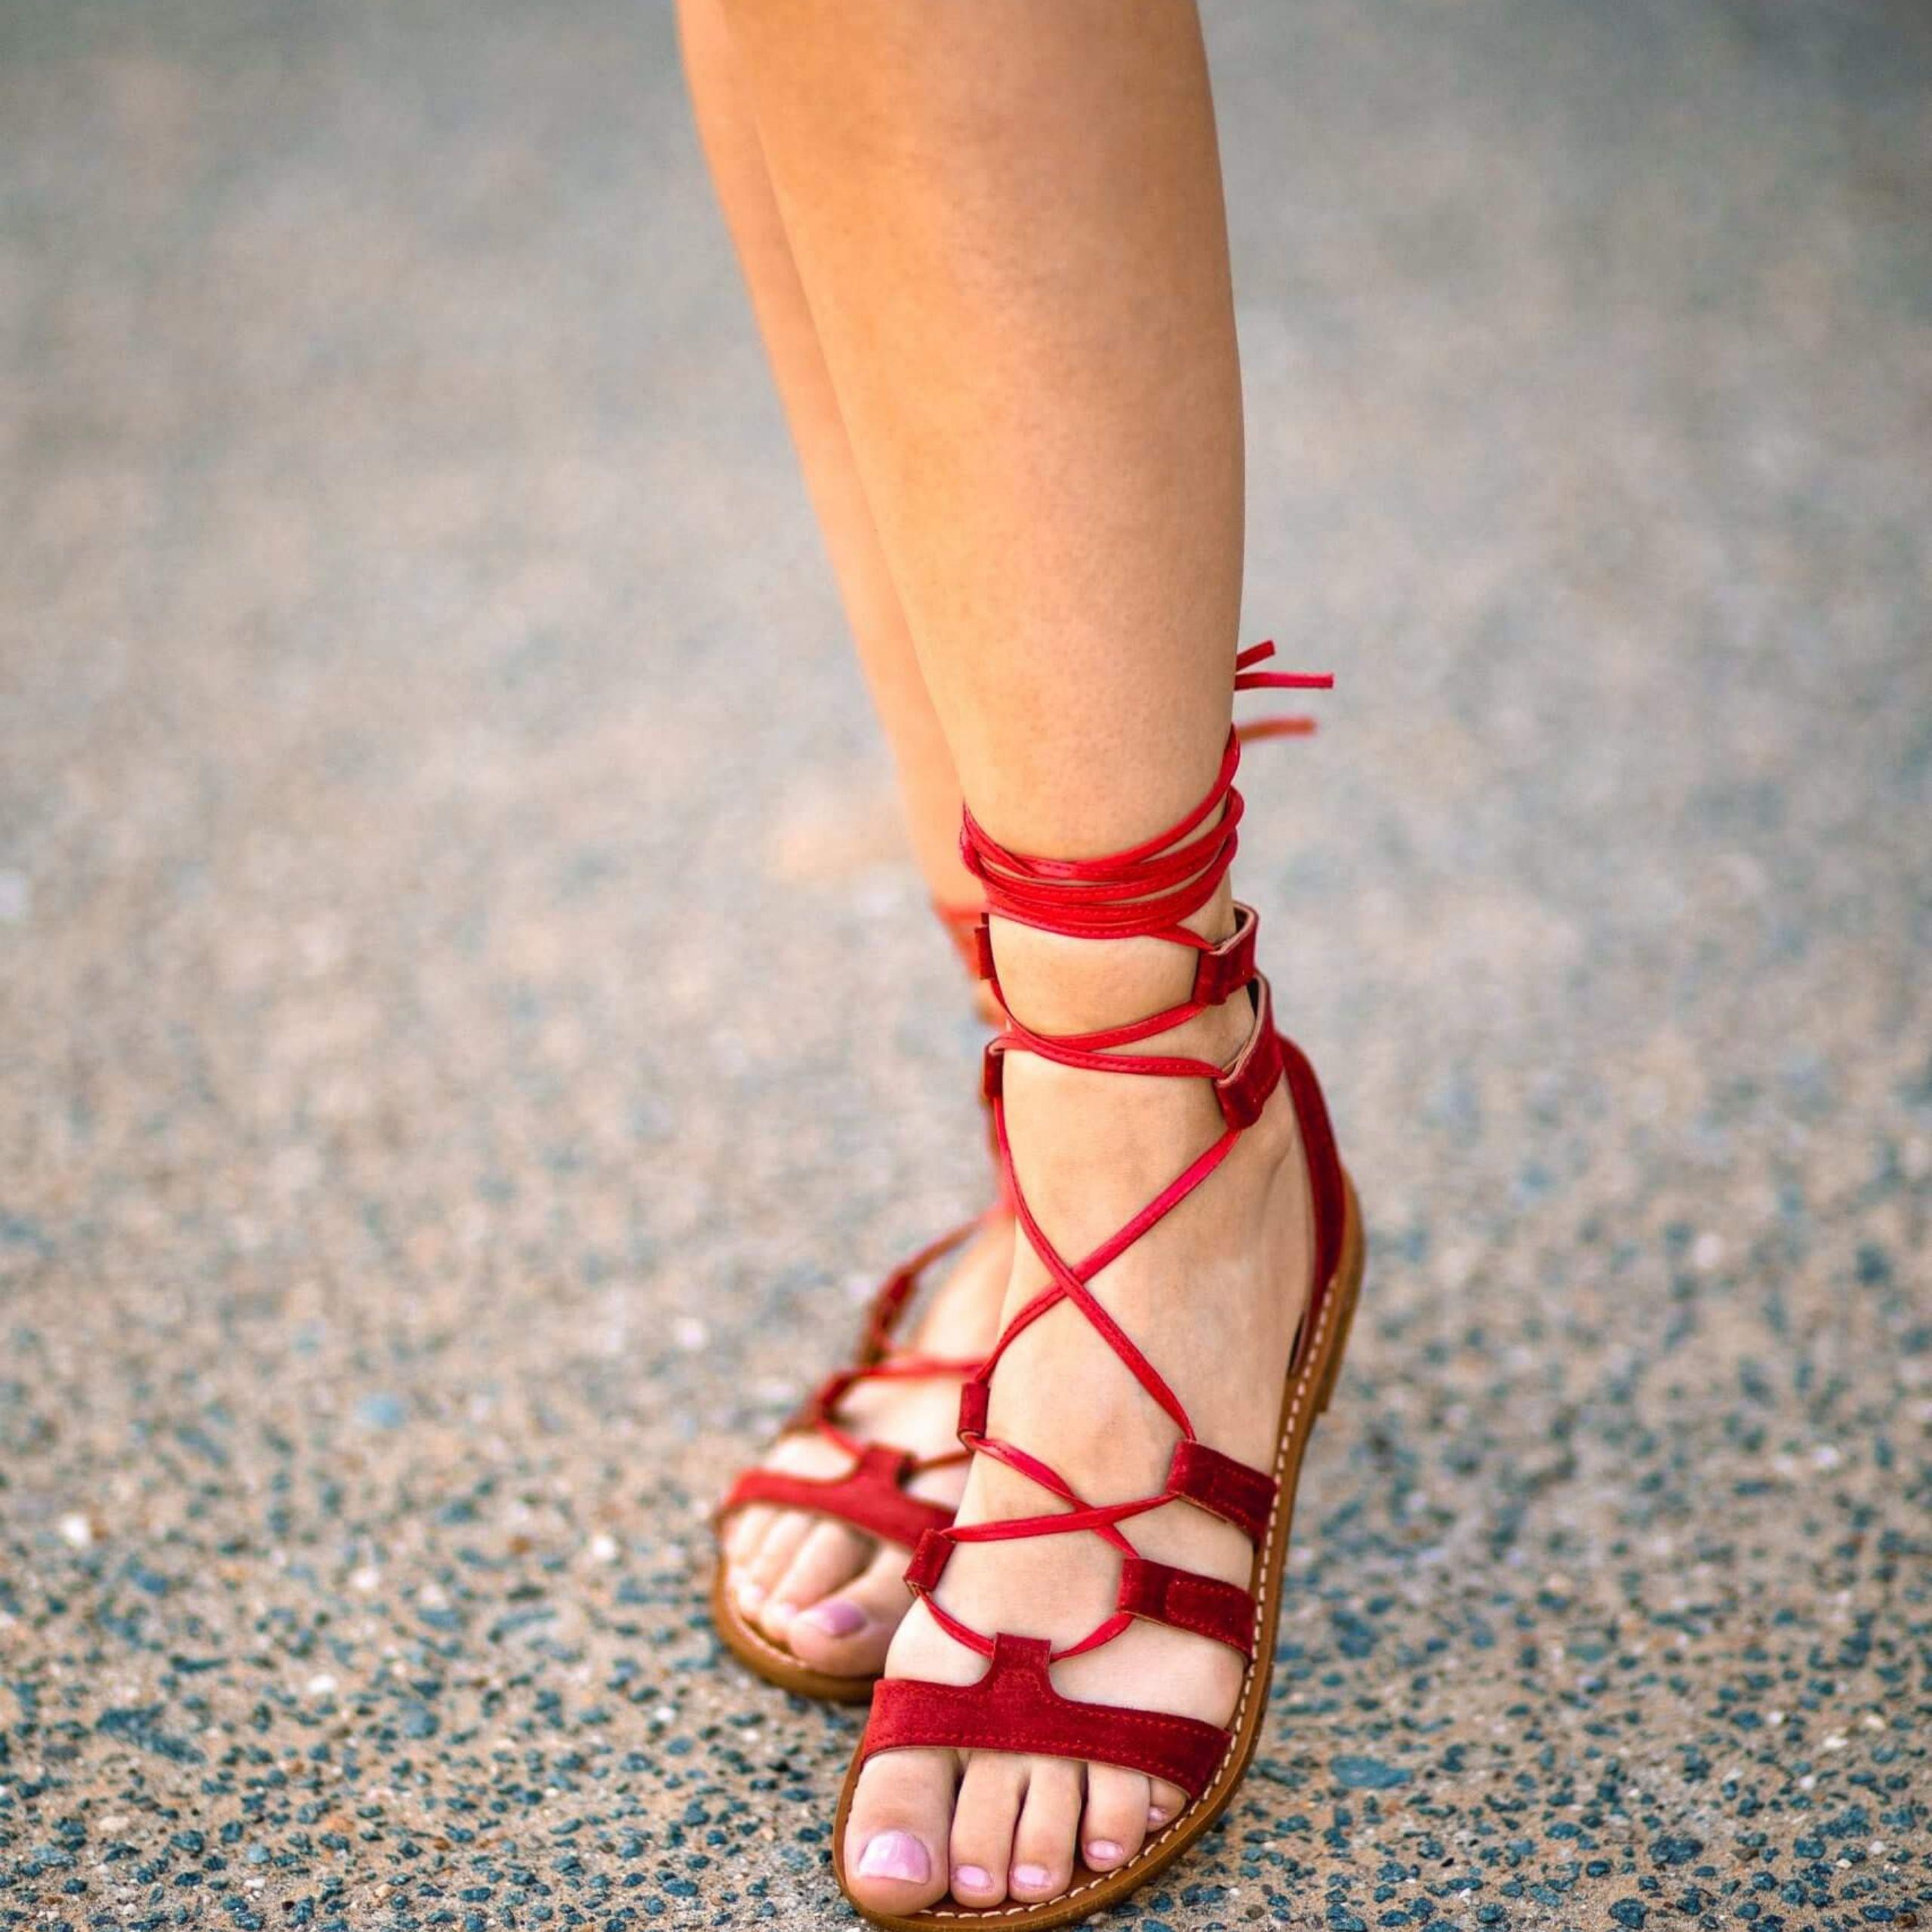 fe-terra-2_lintsandalen sandals travelsandals vegan sustainable sandals wikkelsandalen